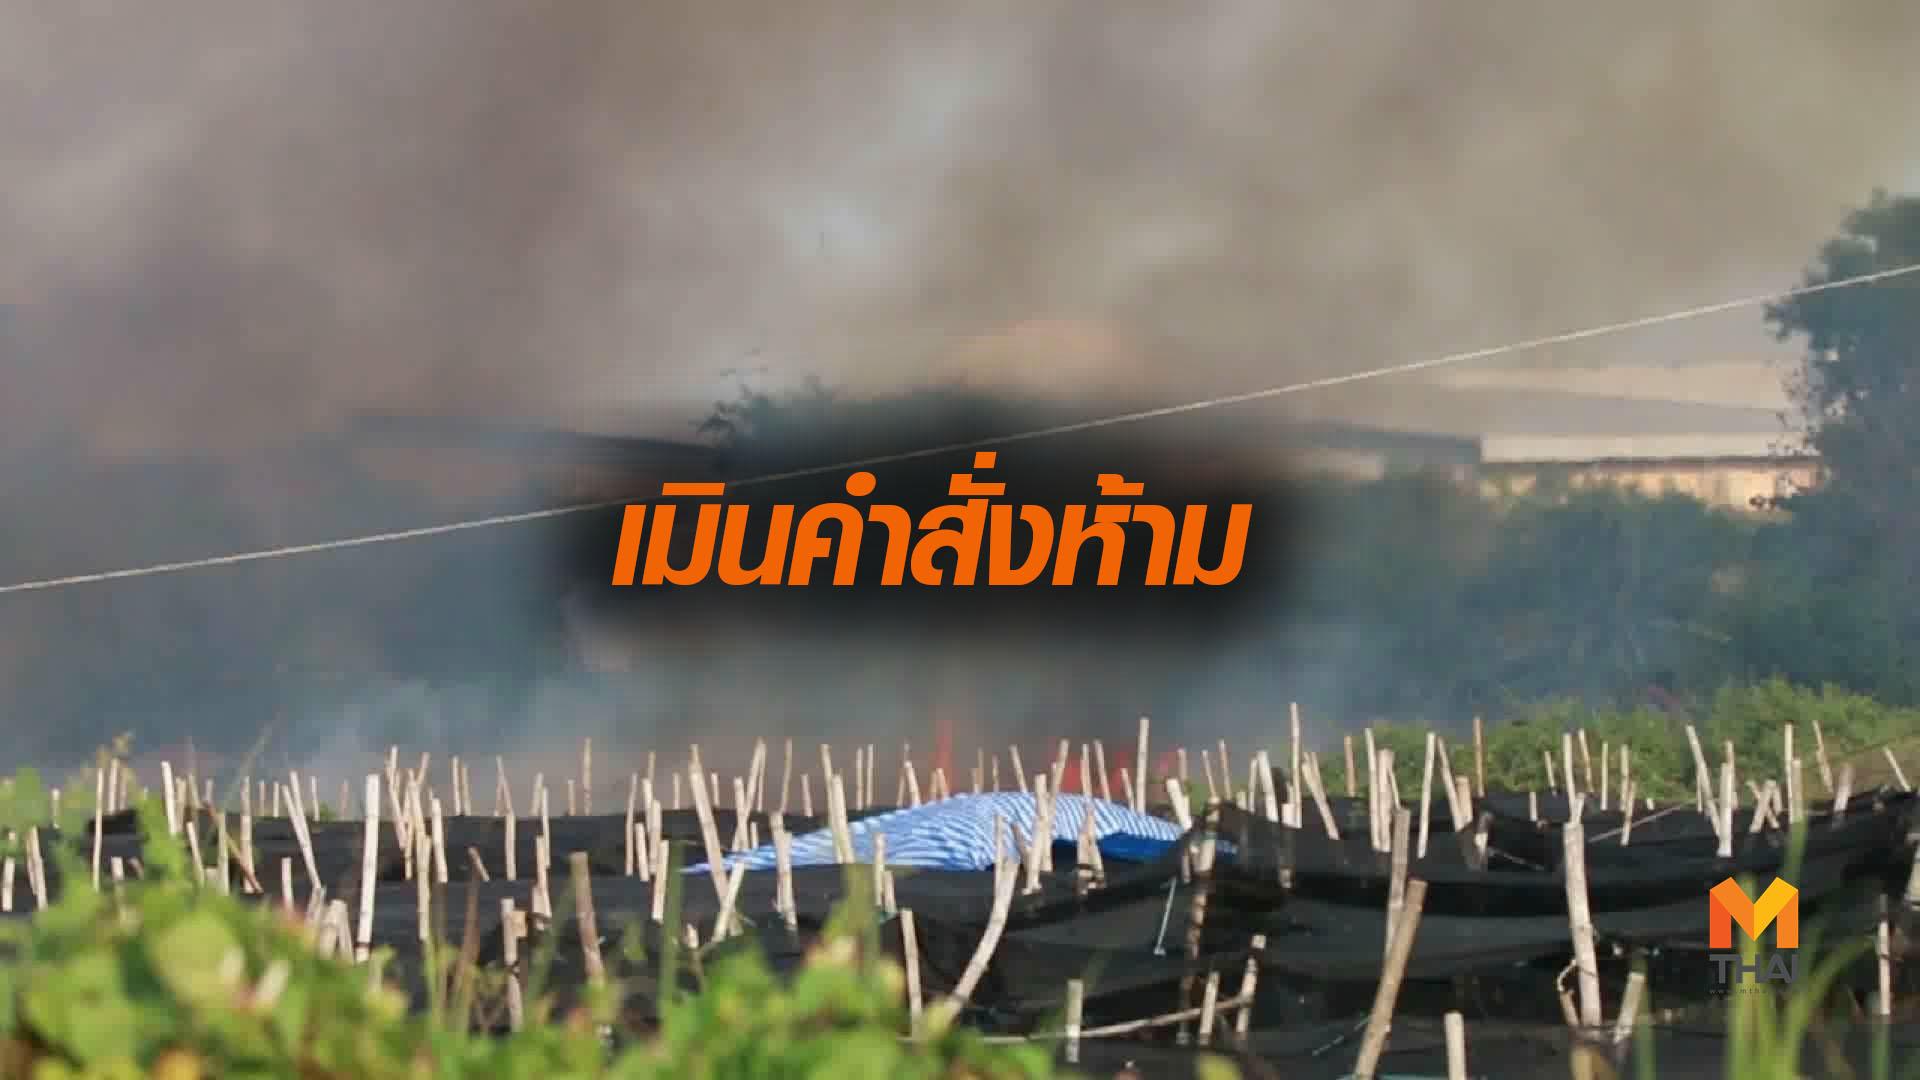 PM2.5 ฝุ่น PM2.5 เผานา เผาไร่